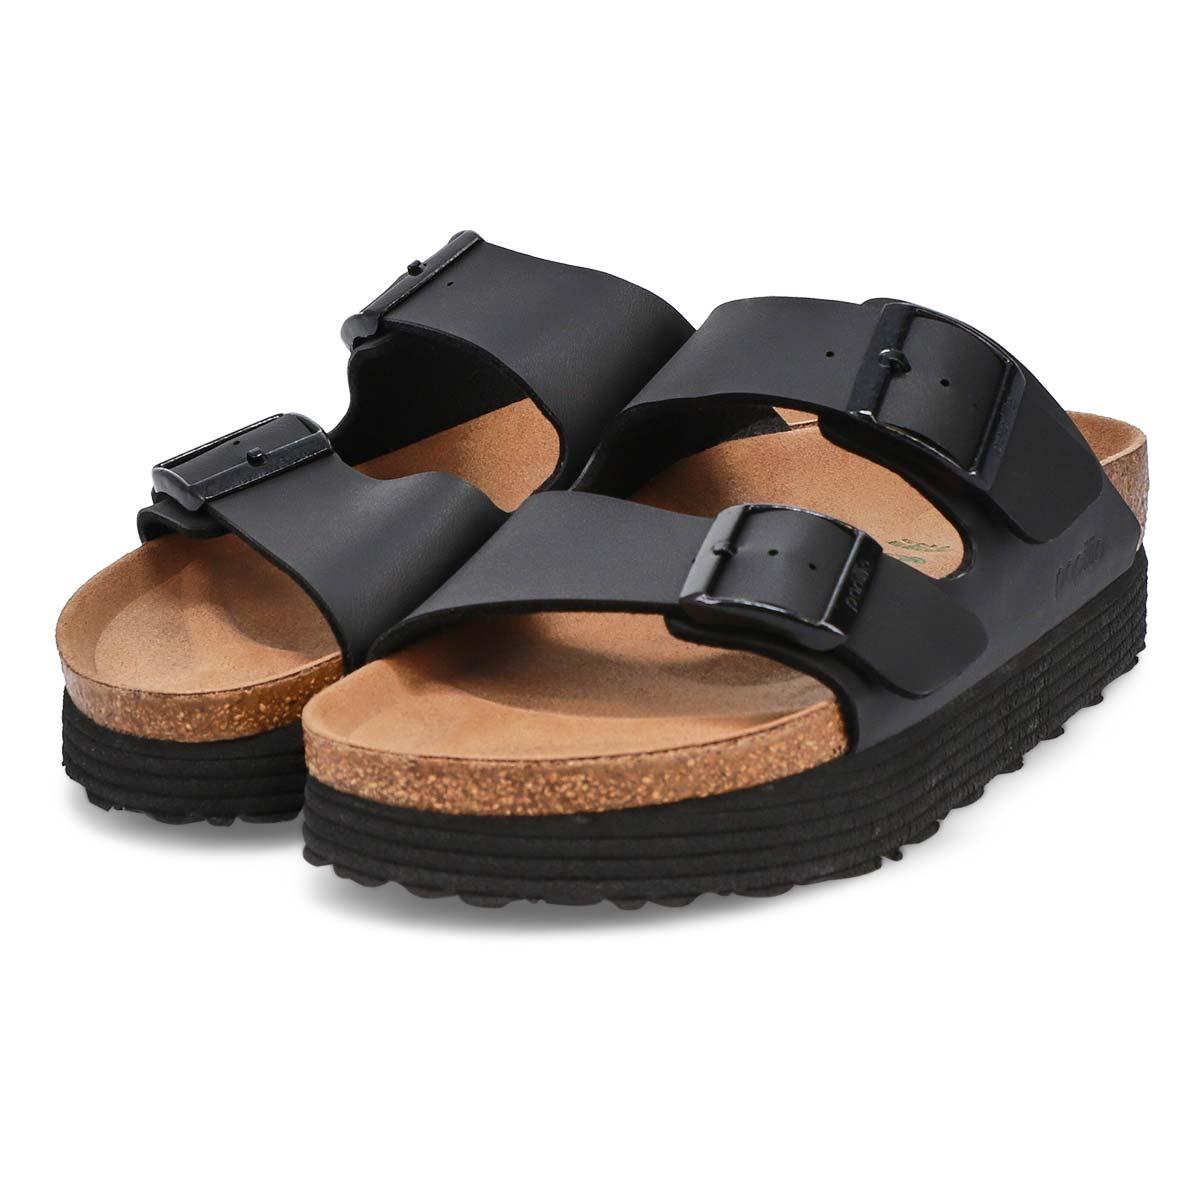 Sandale ARIZONA PLATFORM VEGAN Étroite